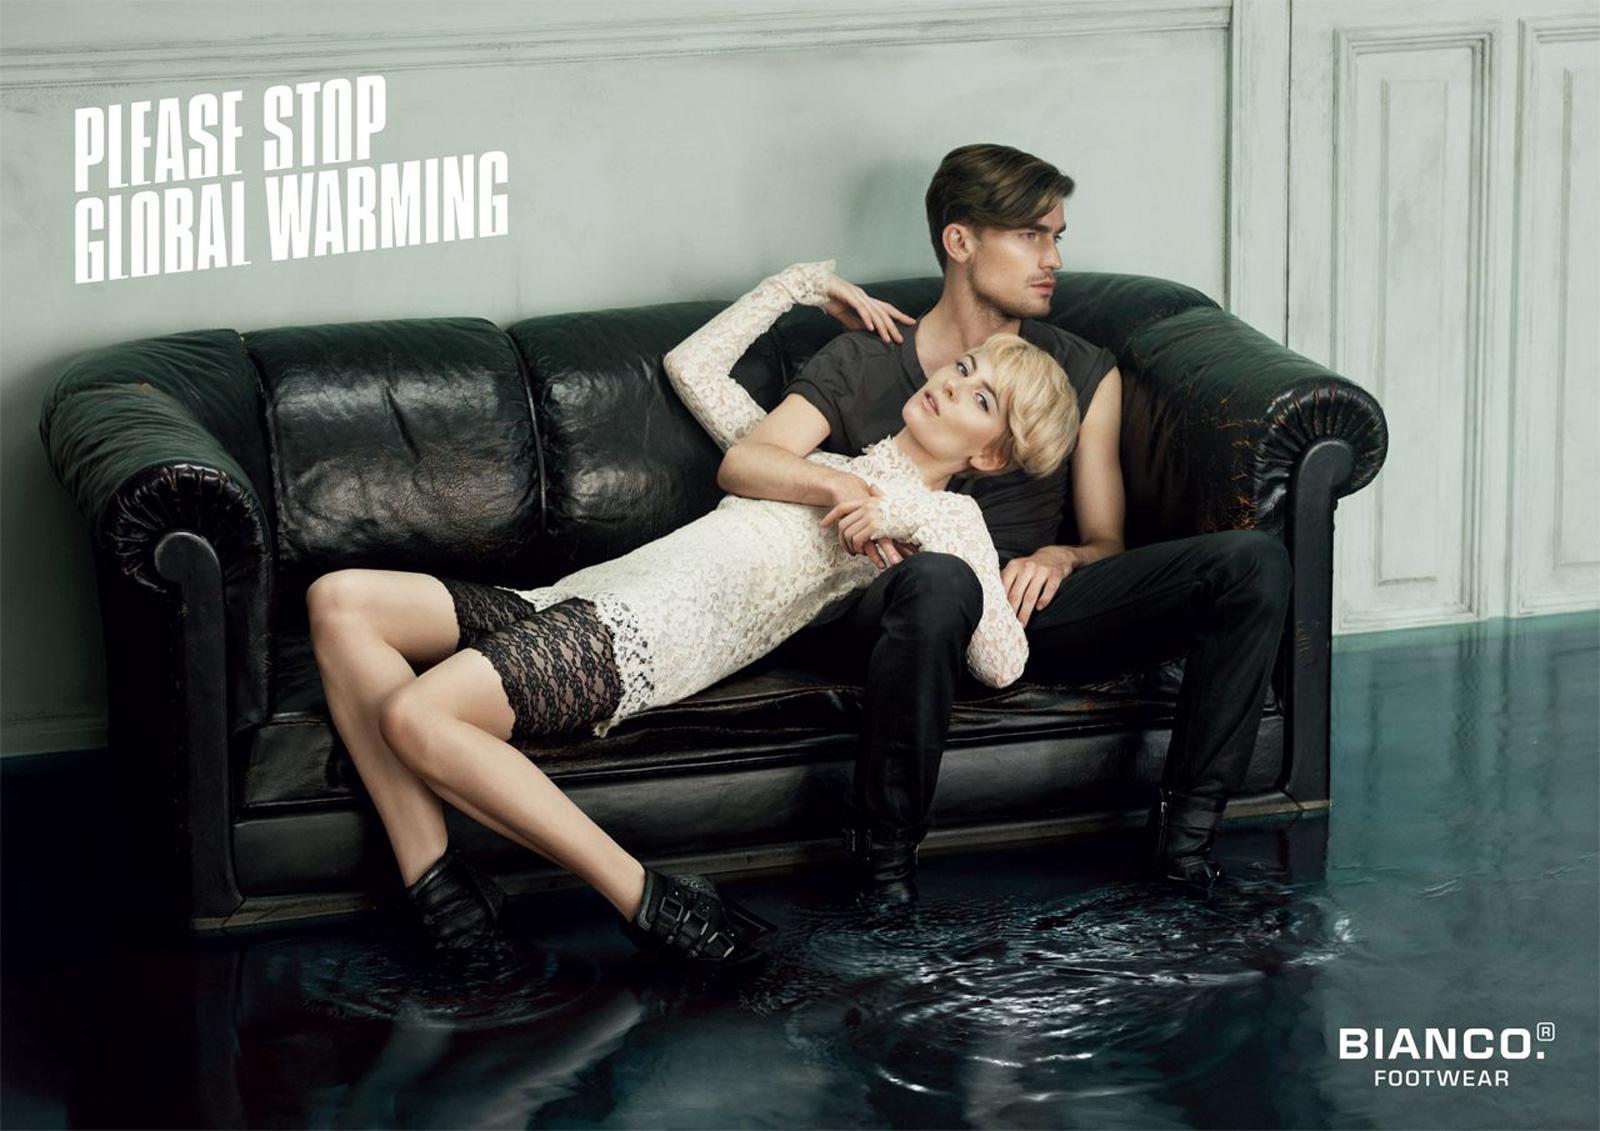 Bianco Print Ad -  Please stop global warming, 3